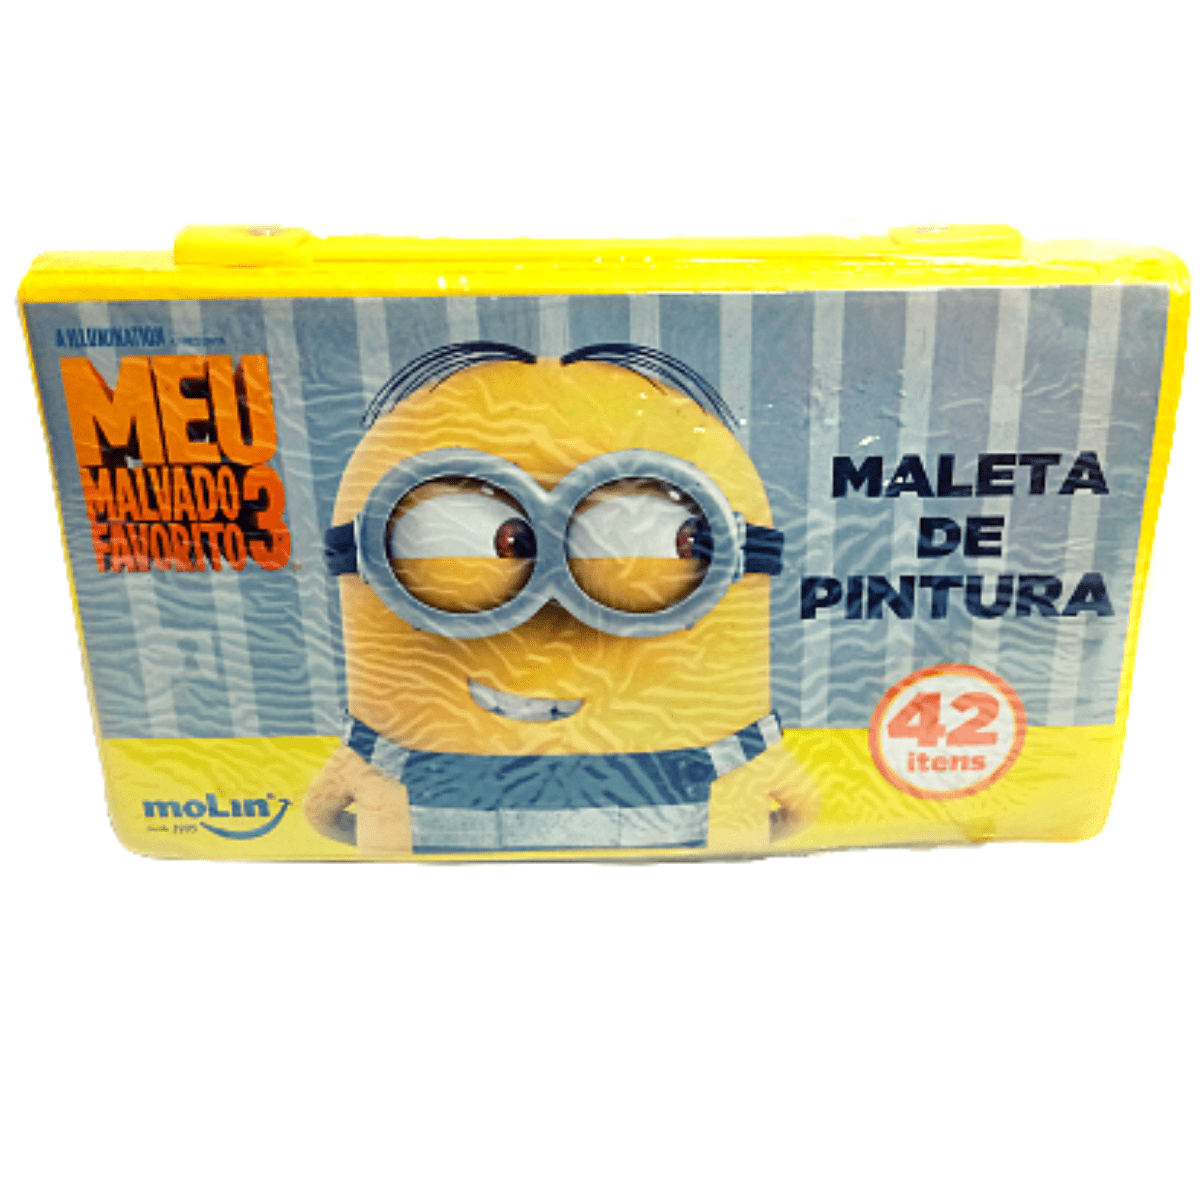 Maleta de pintura Minions 42 itens - Molin